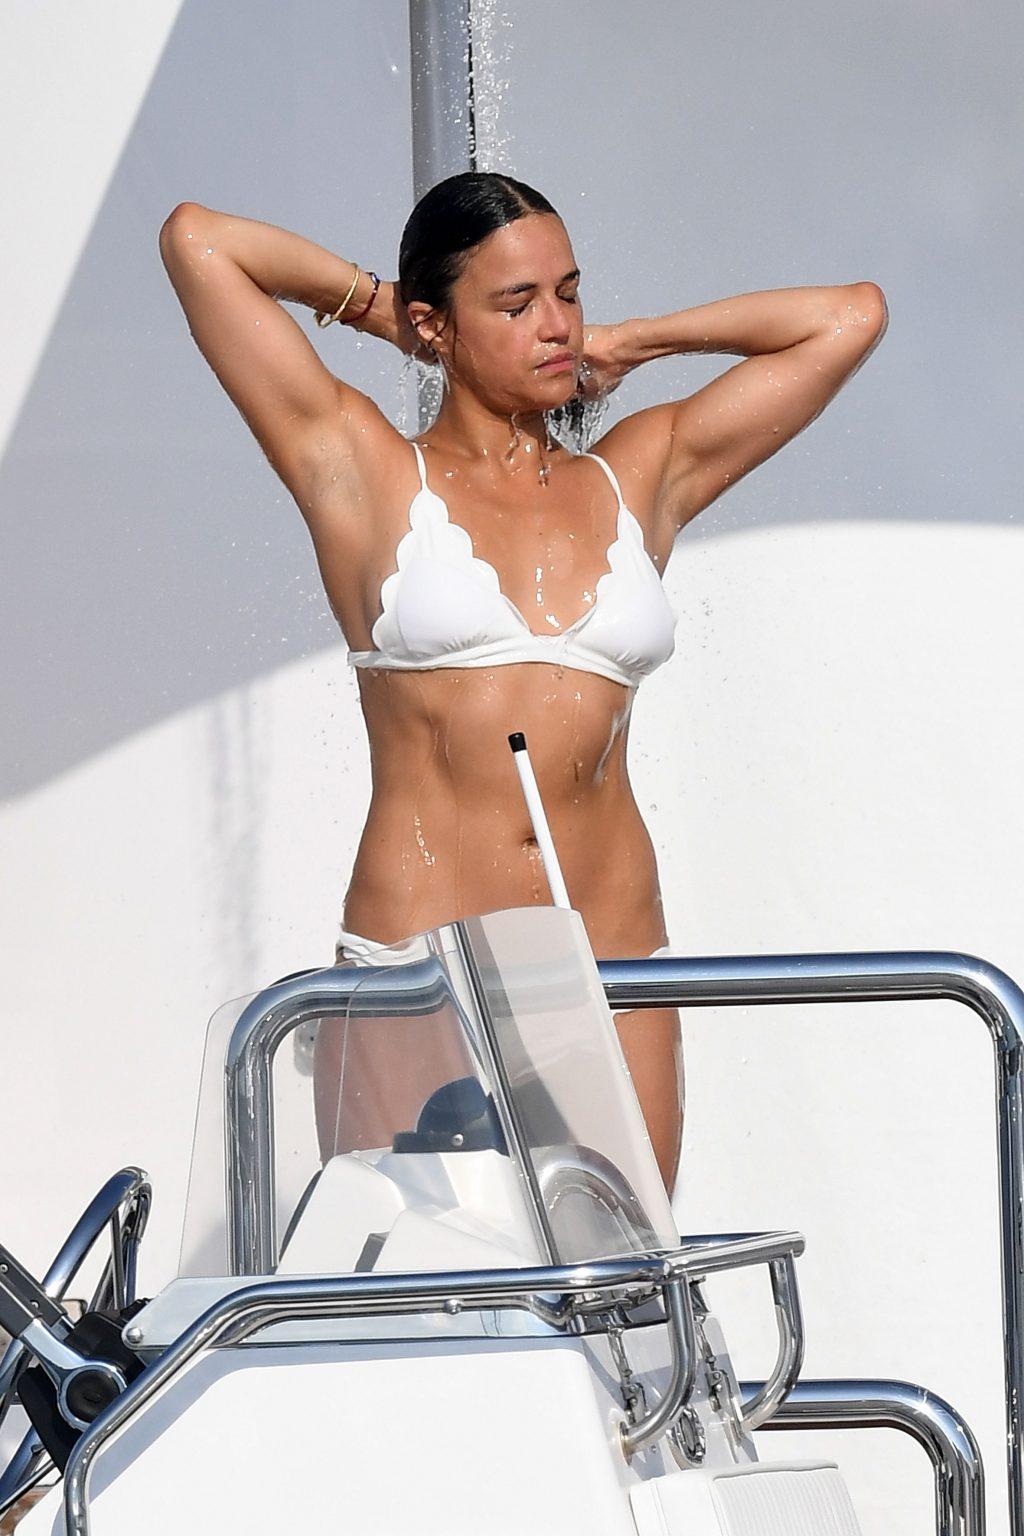 Michelle Rodriguez Bikini girlfappening.com 1